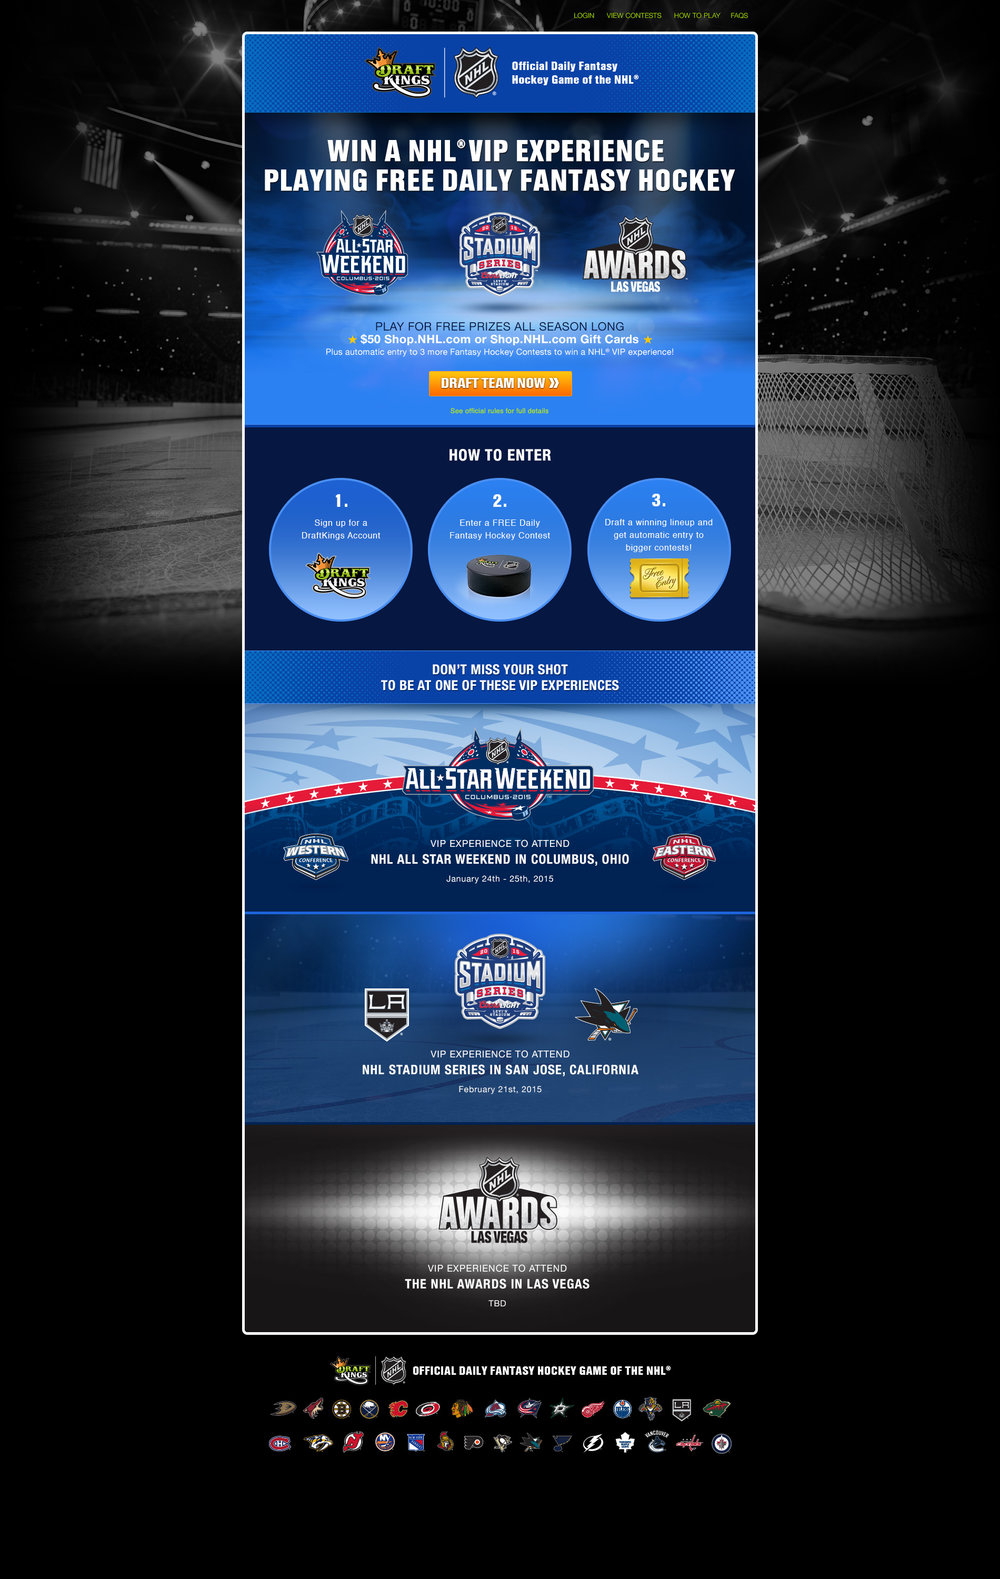 DK_NHL_daily_game_contest_v7.jpg